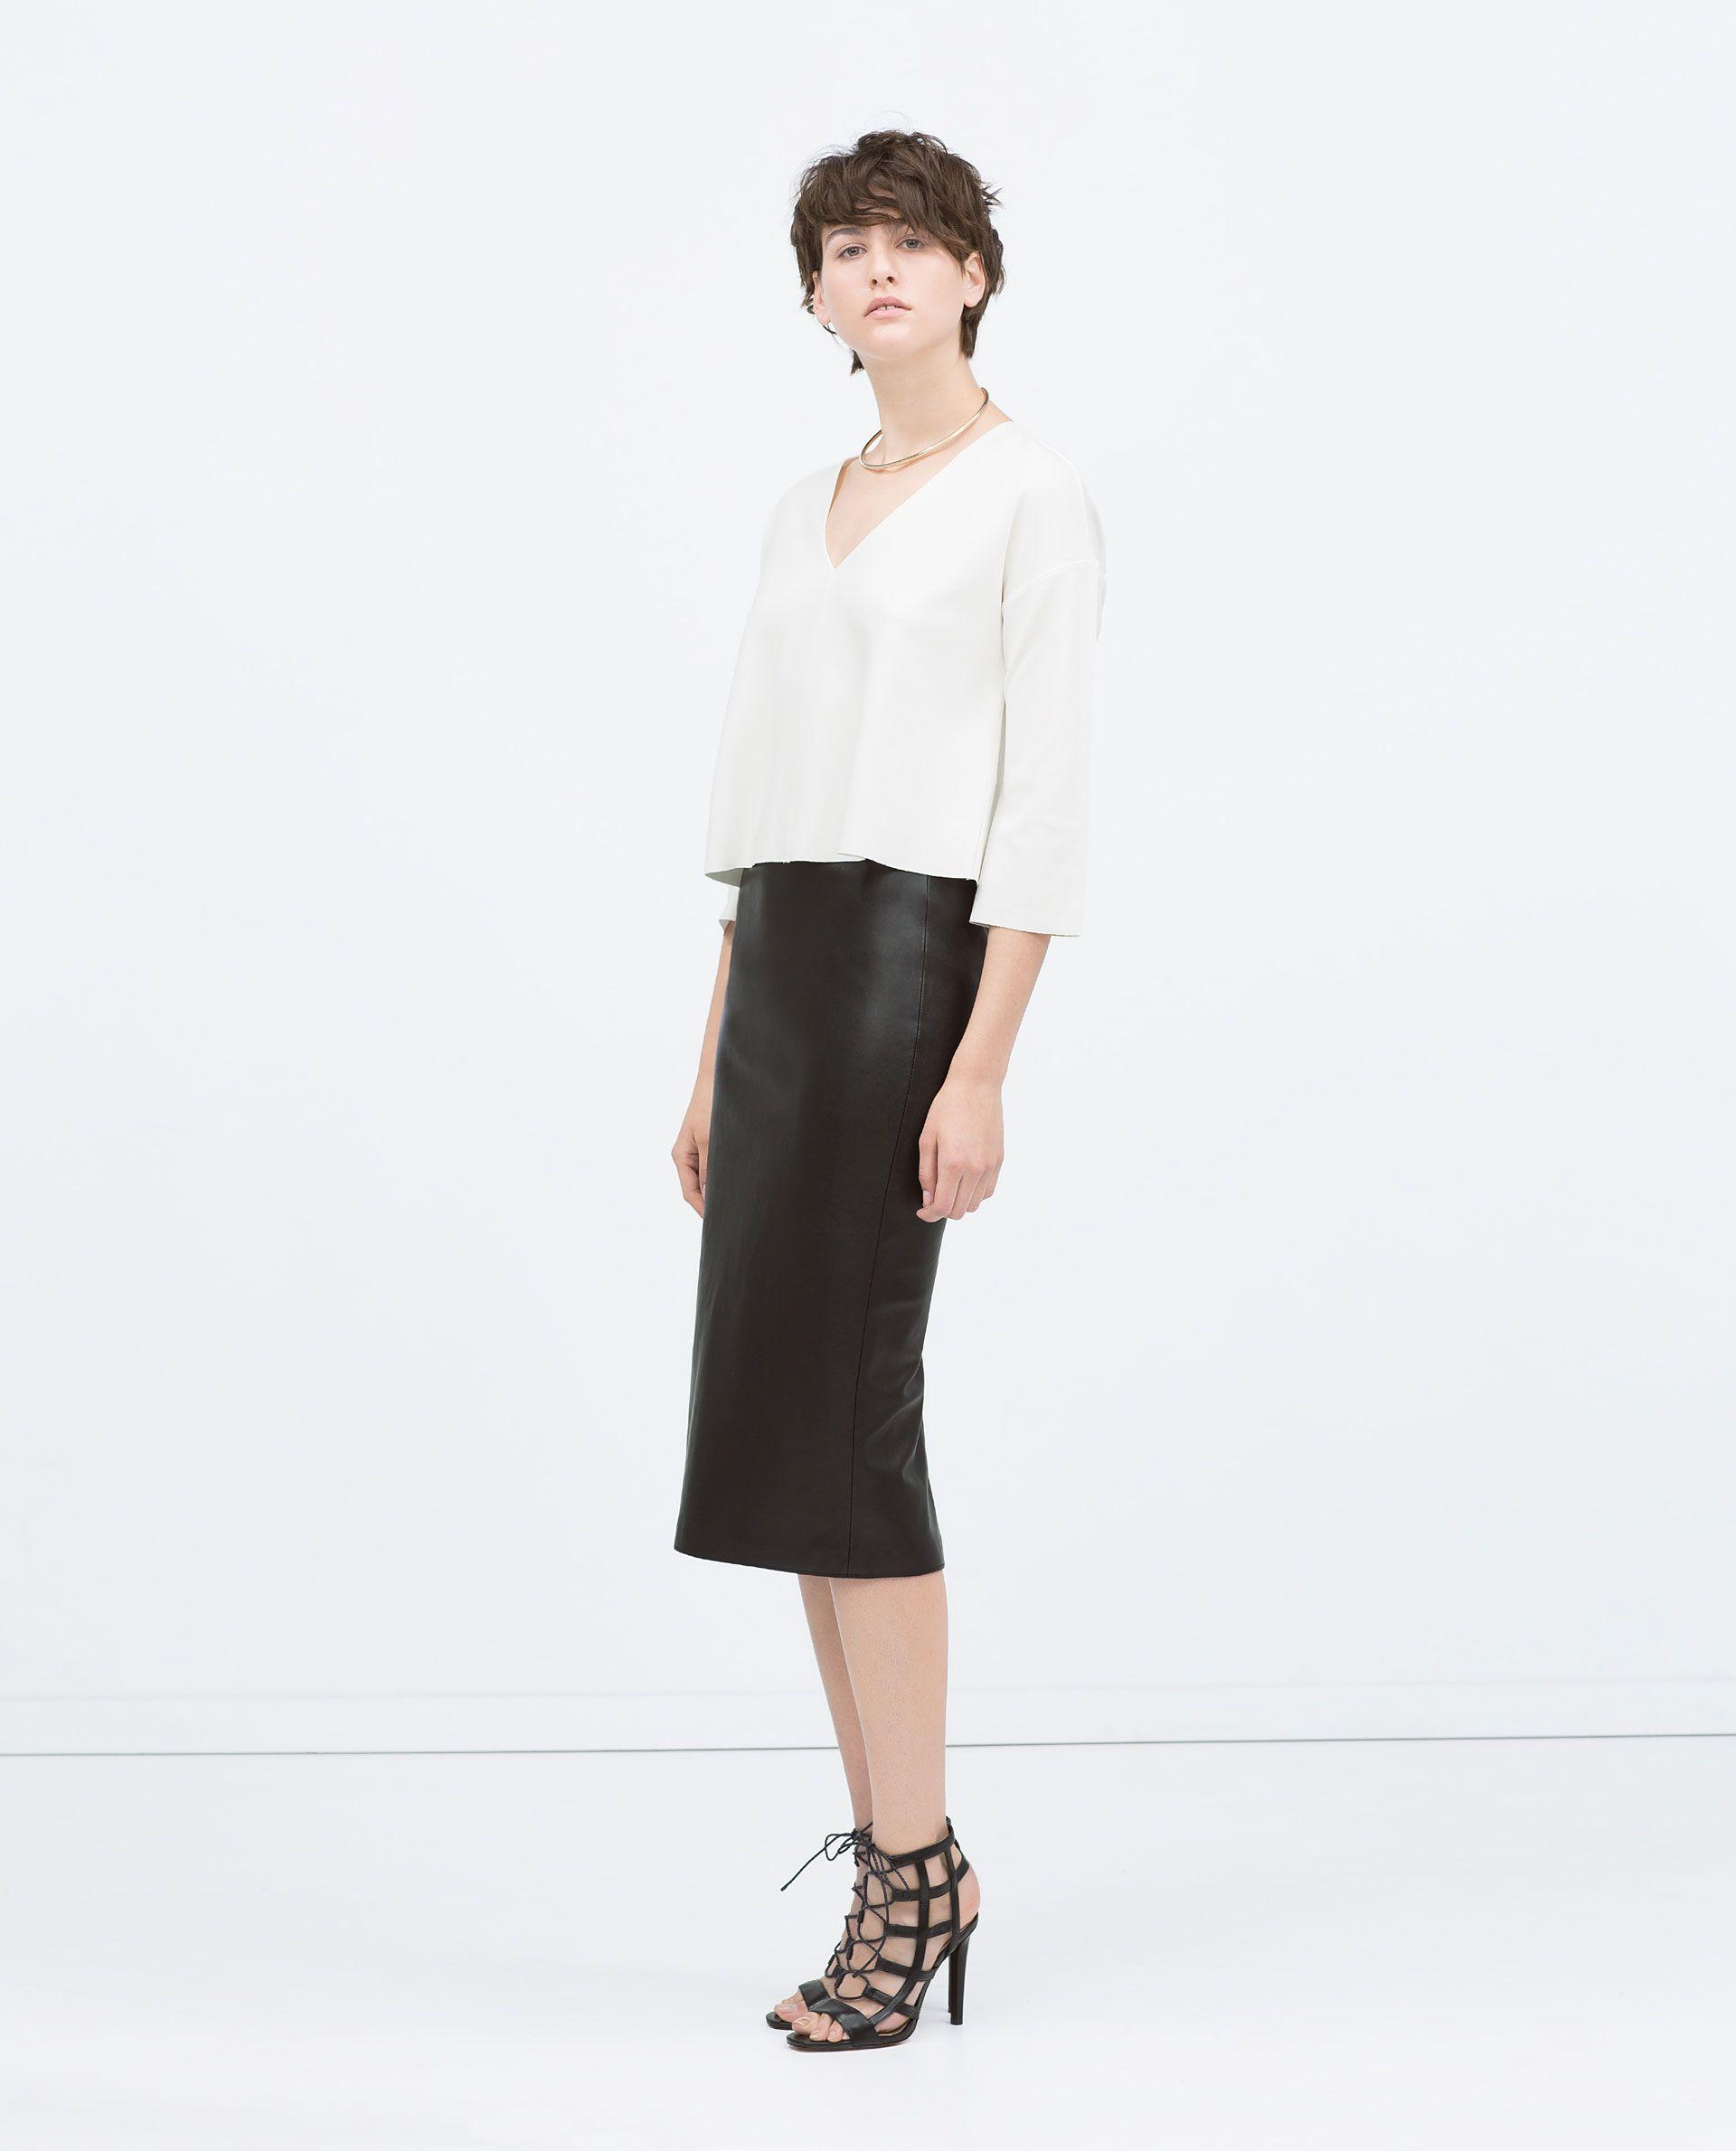 new style & luxury autumn shoes diversified latest designs ZARA - WOMAN - FAUX LEATHER MIDI PENCIL SKIRT | Fashion ...